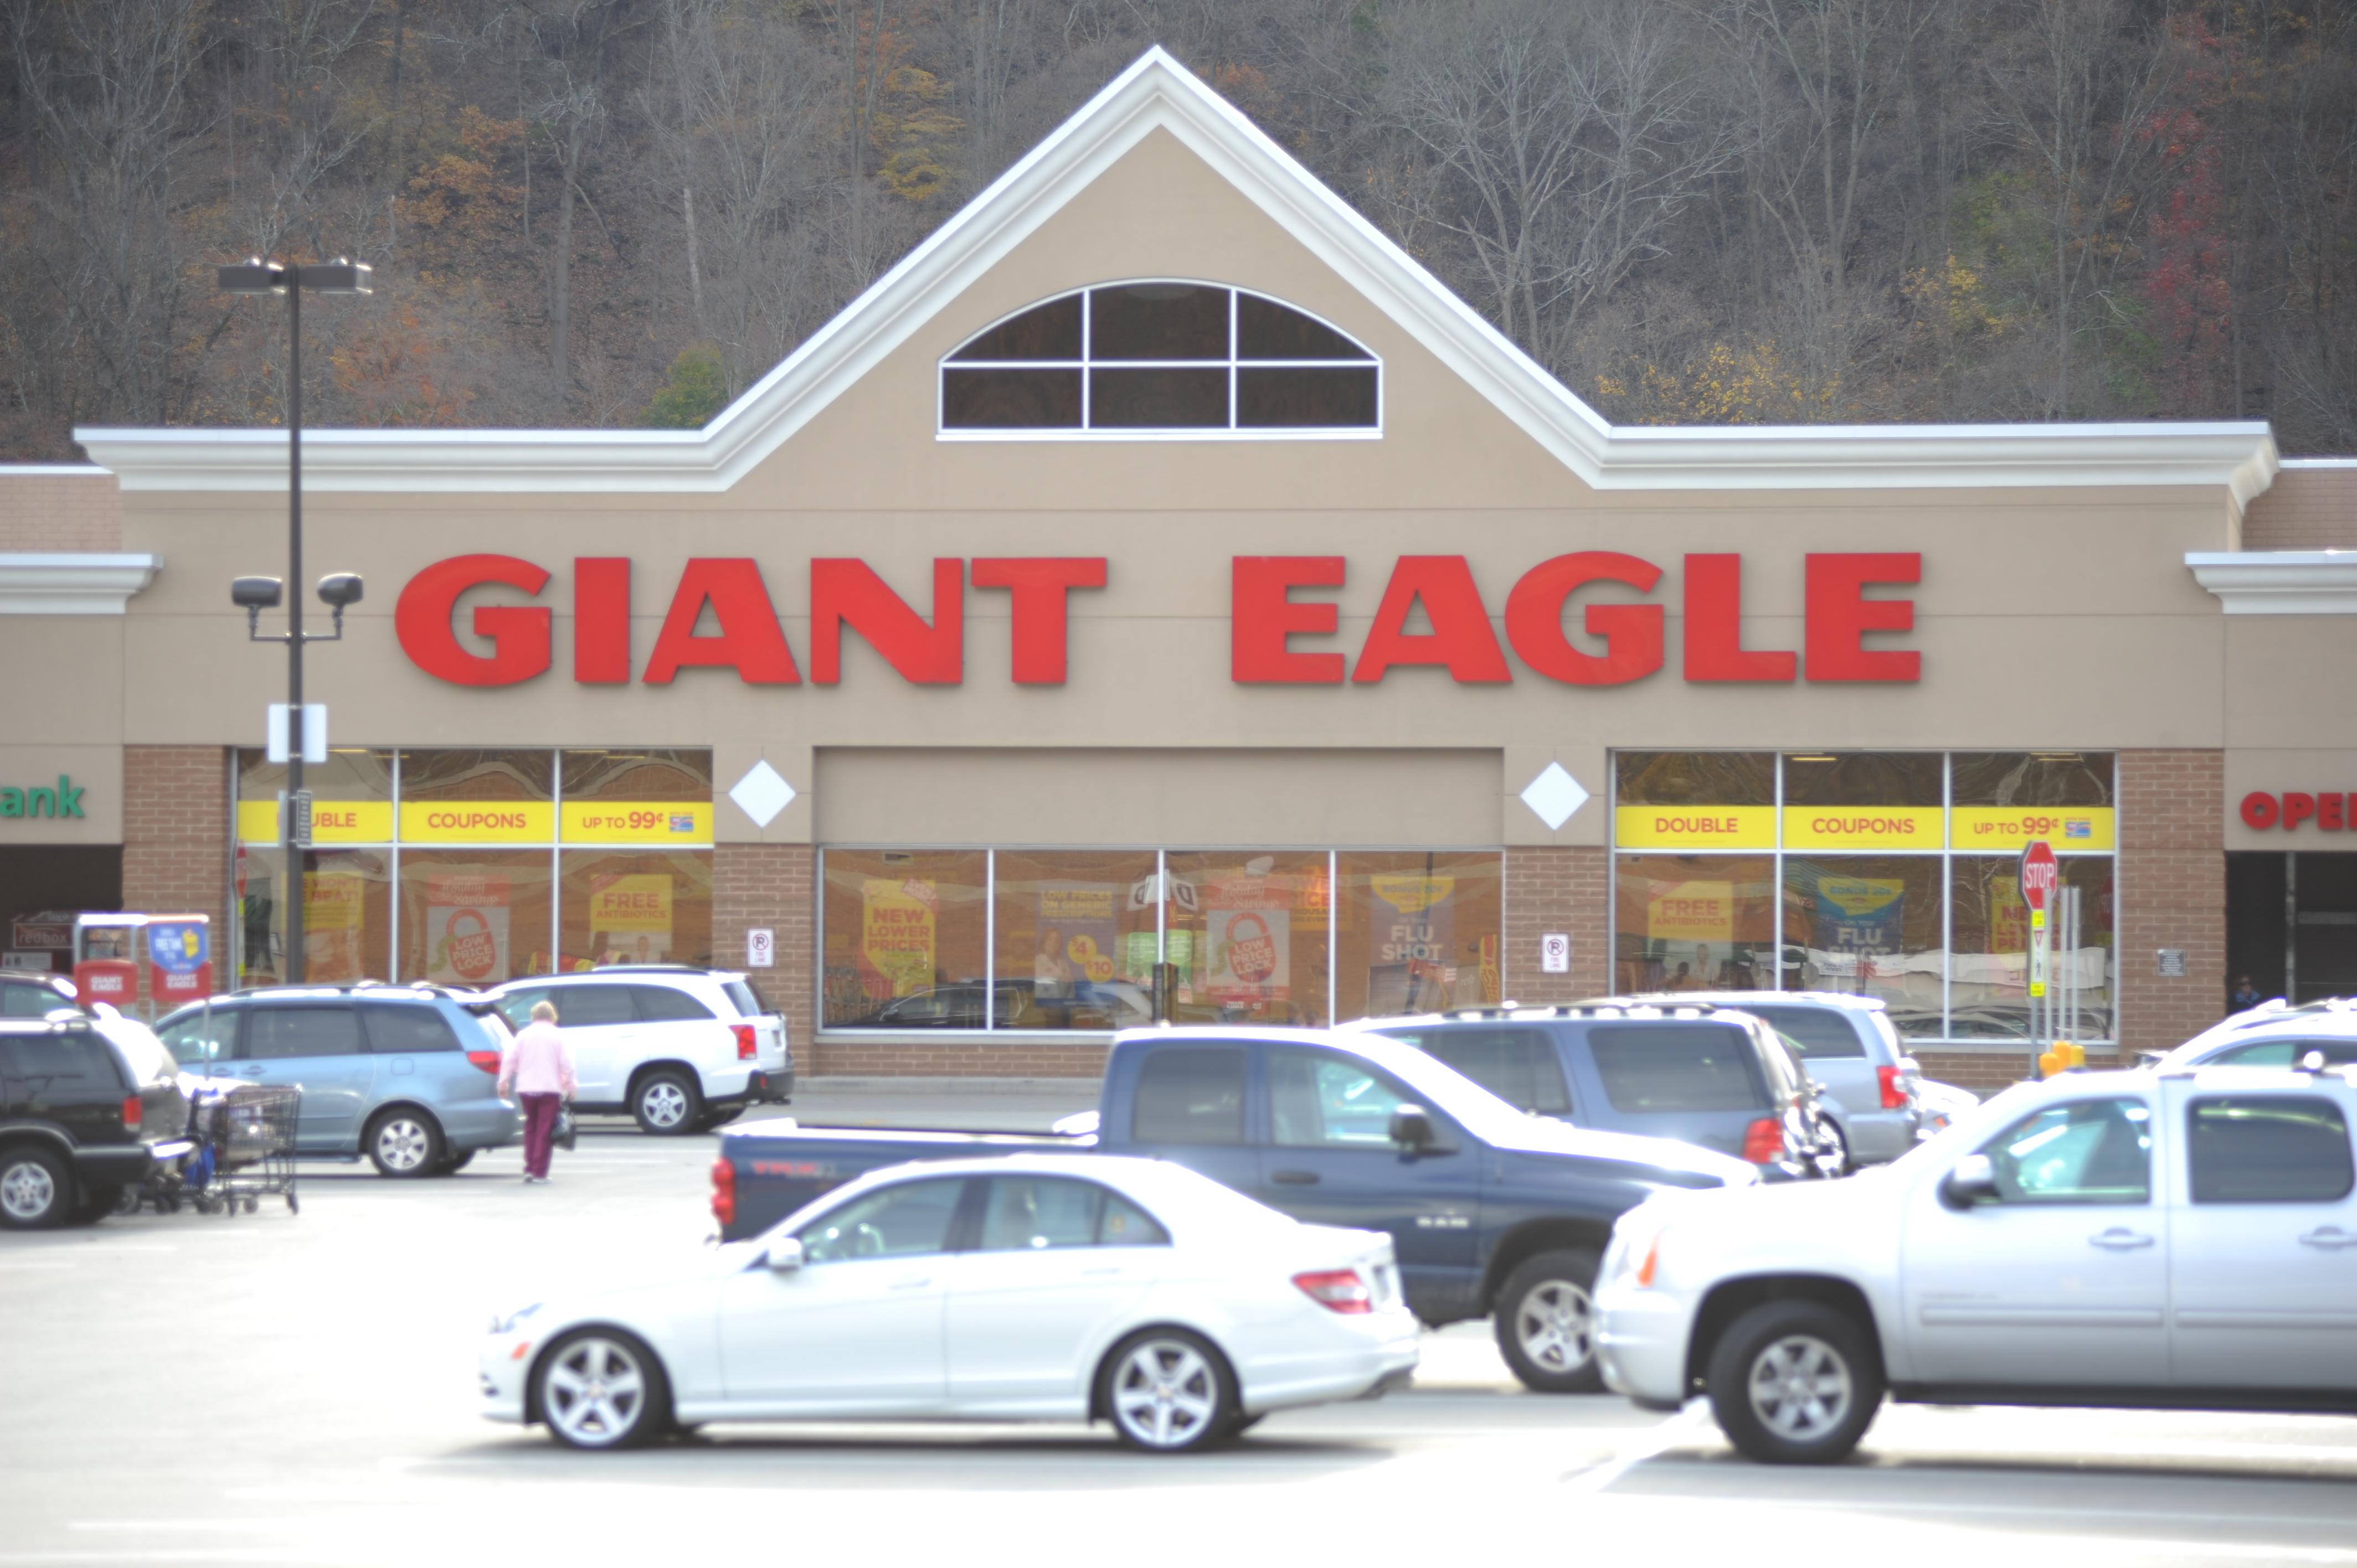 Giant eagle shop online